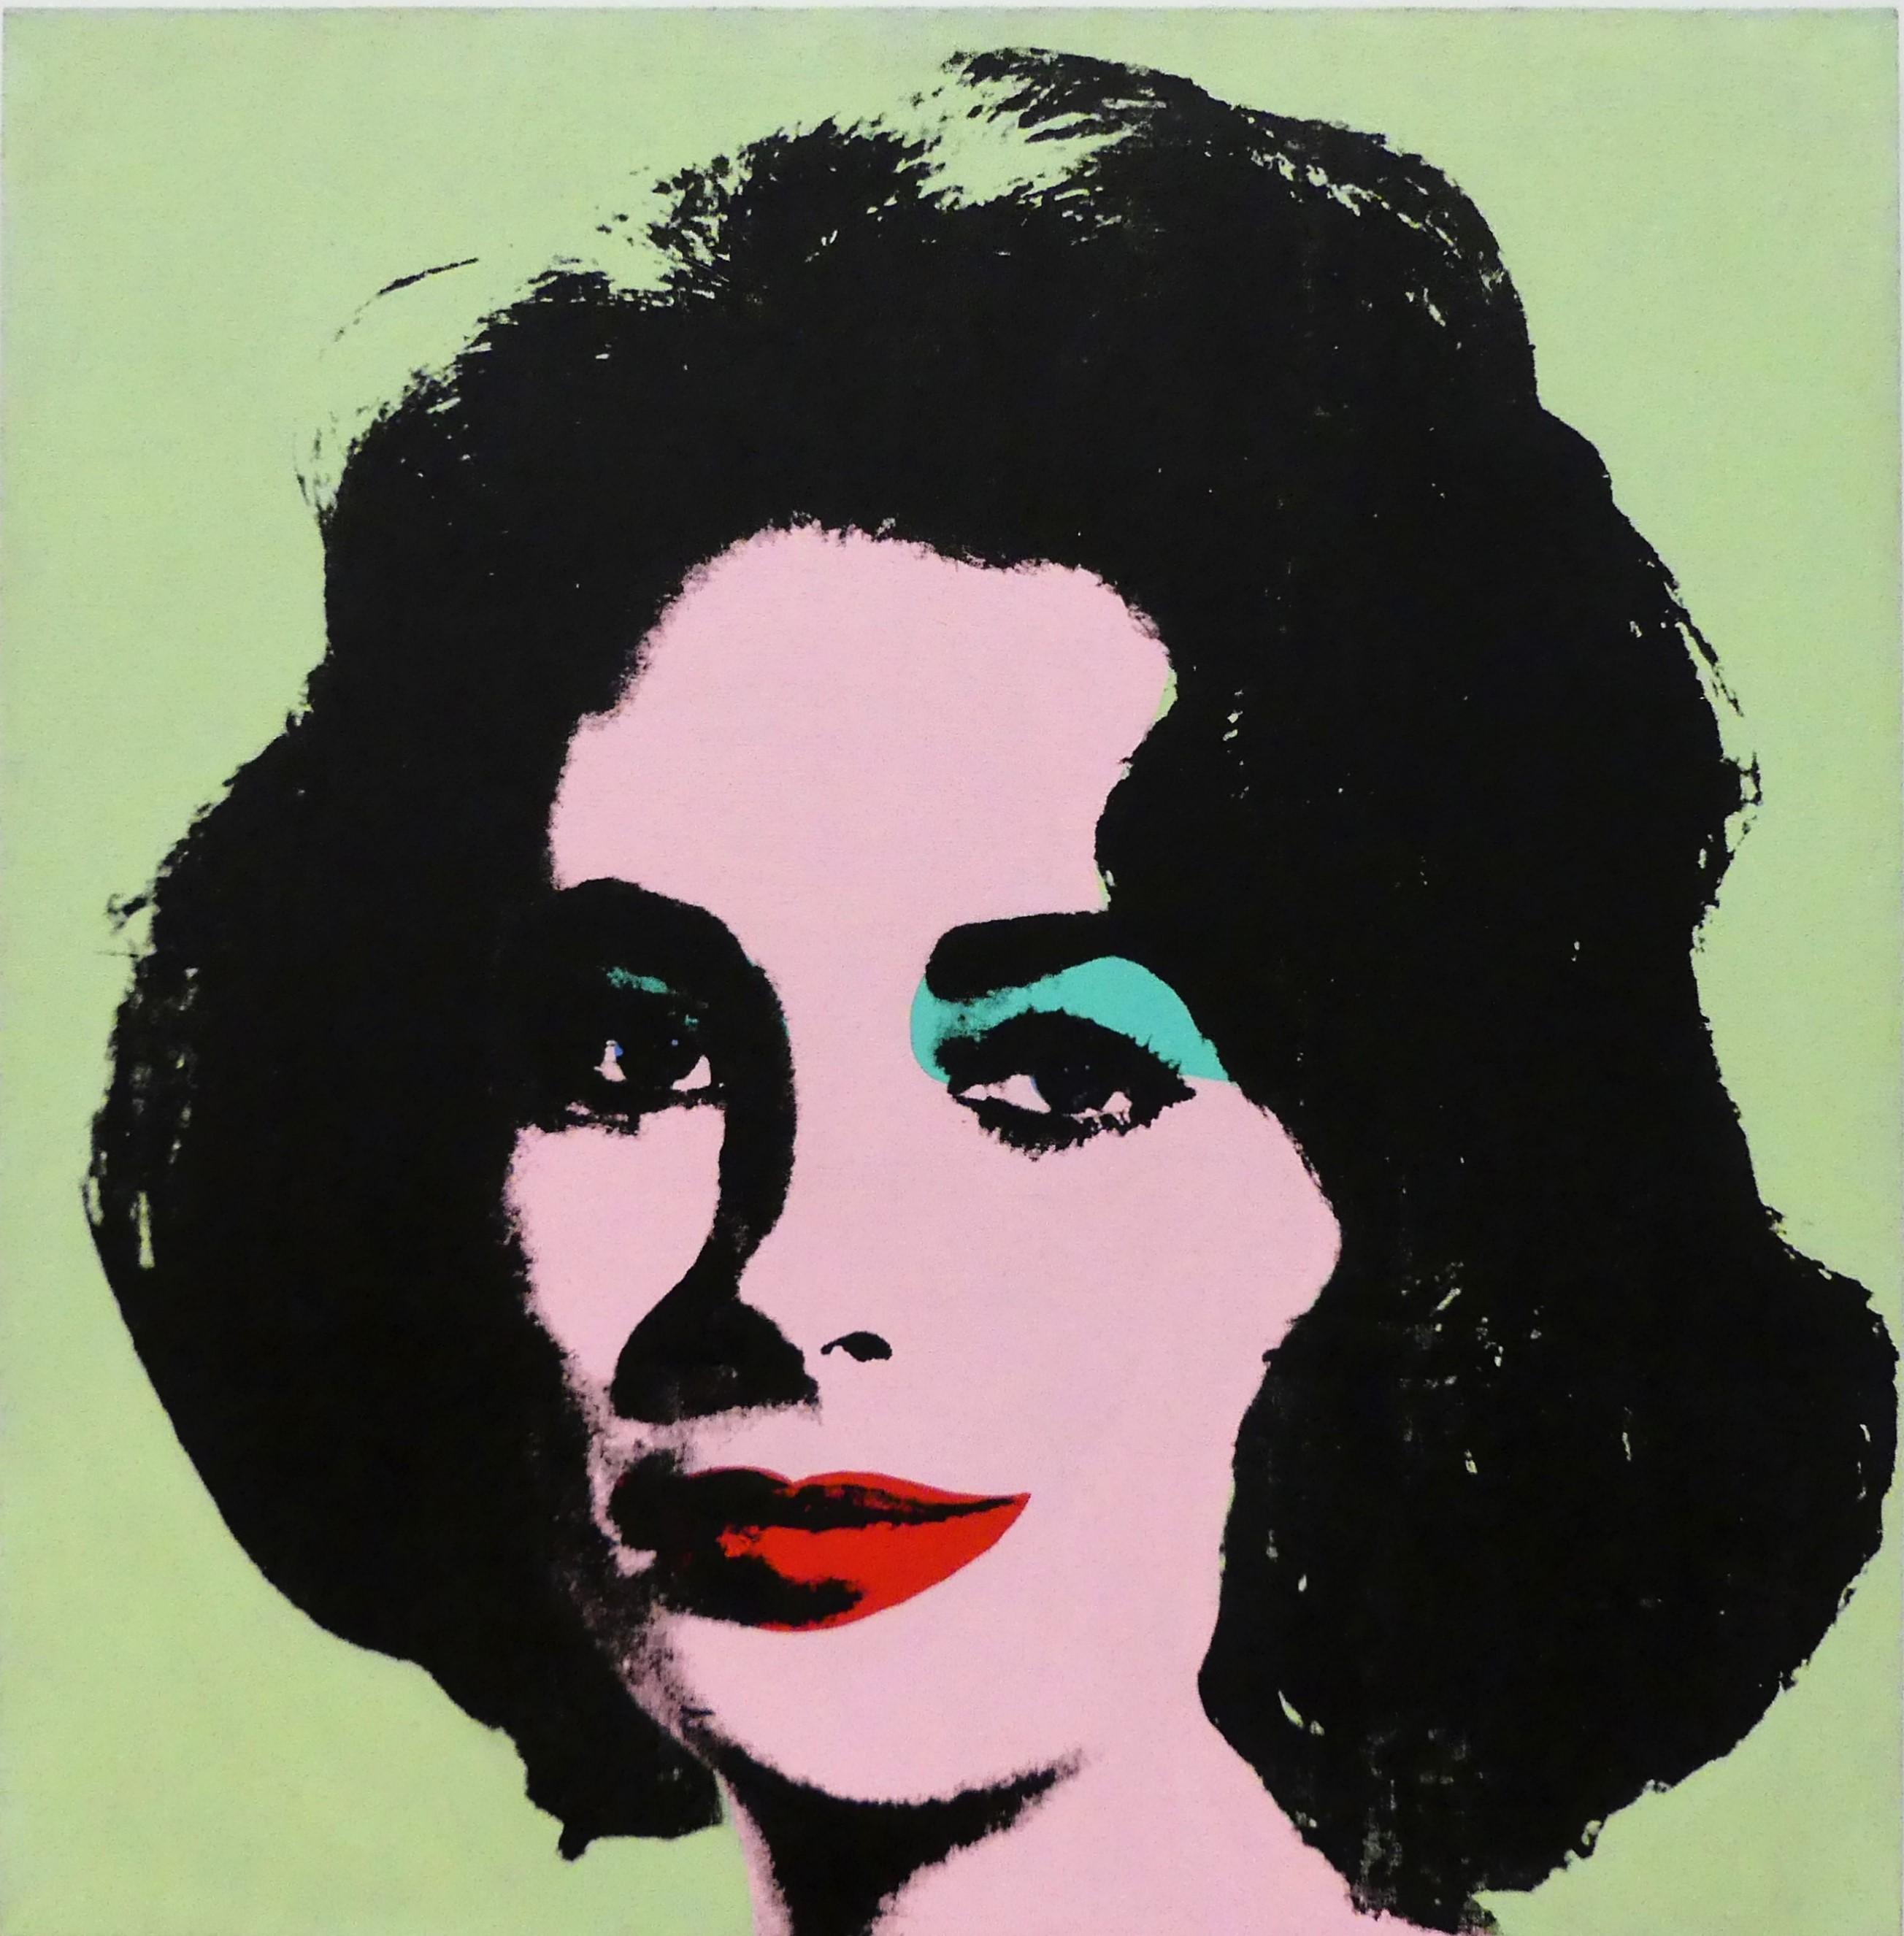 Andy Warhol's Liz #3